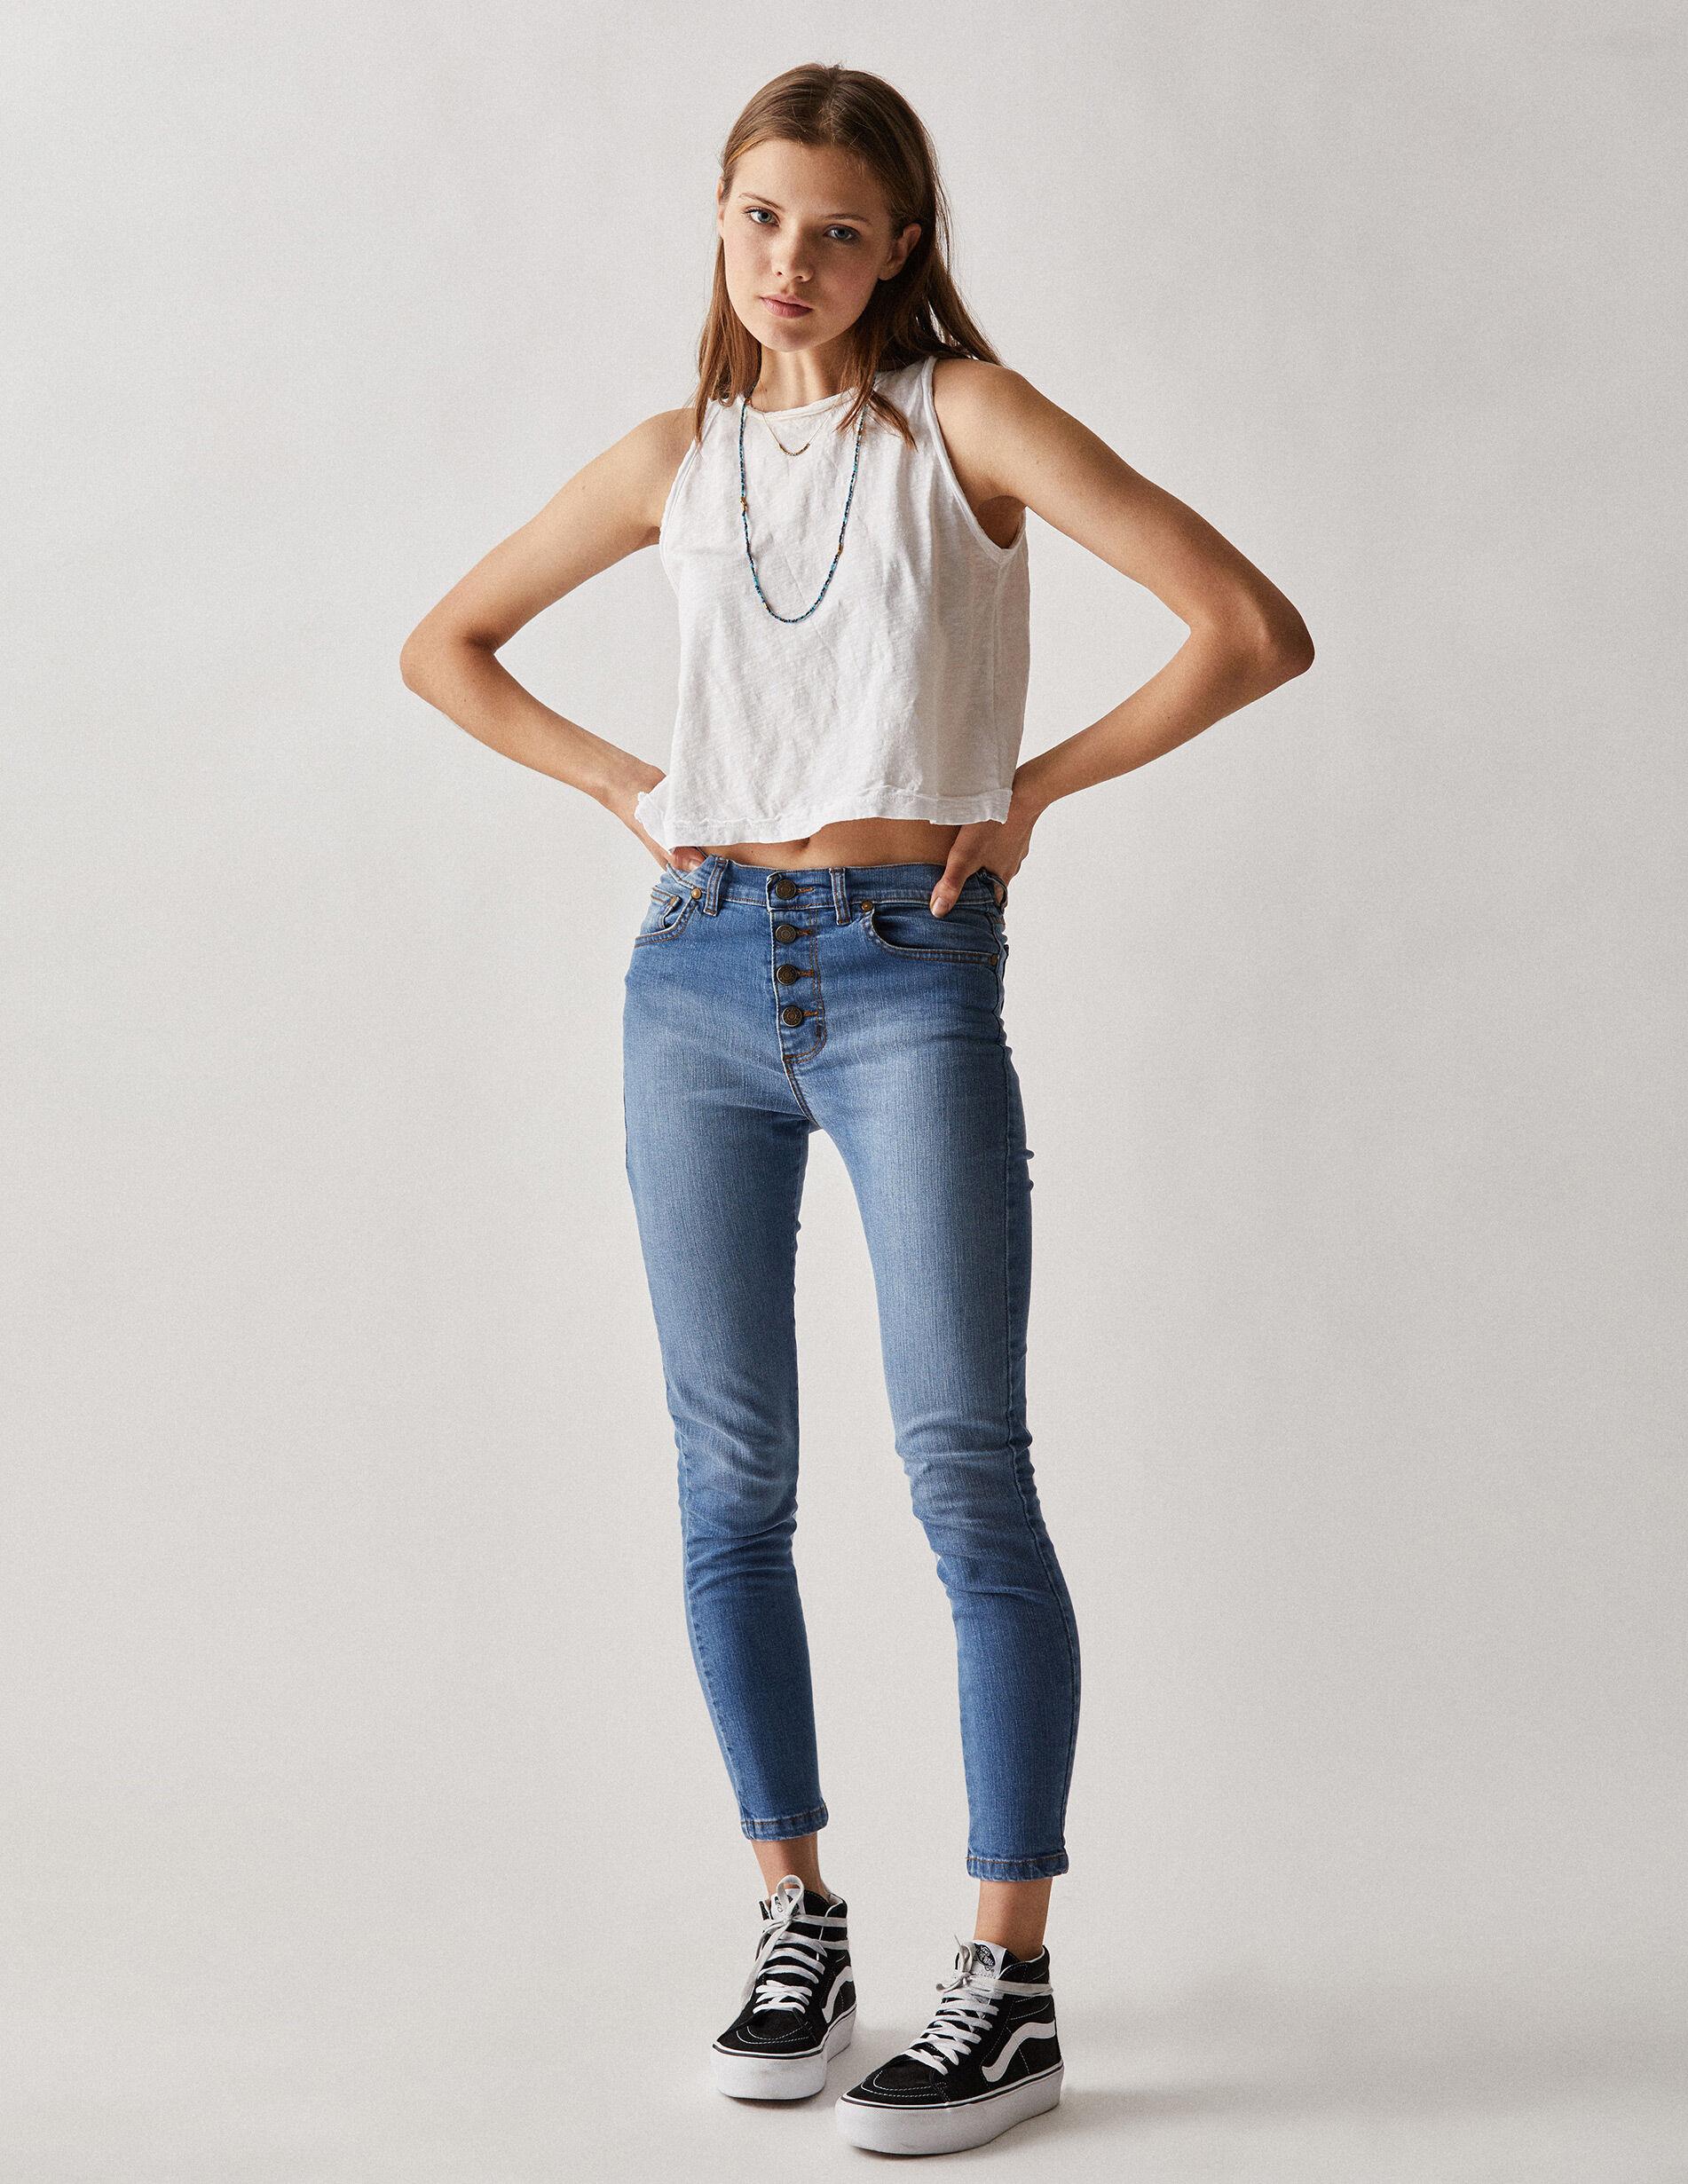 Online Para Mujer Pantalones Nícoli Comprar Svqwrsy Vaqueros tXqPpdx